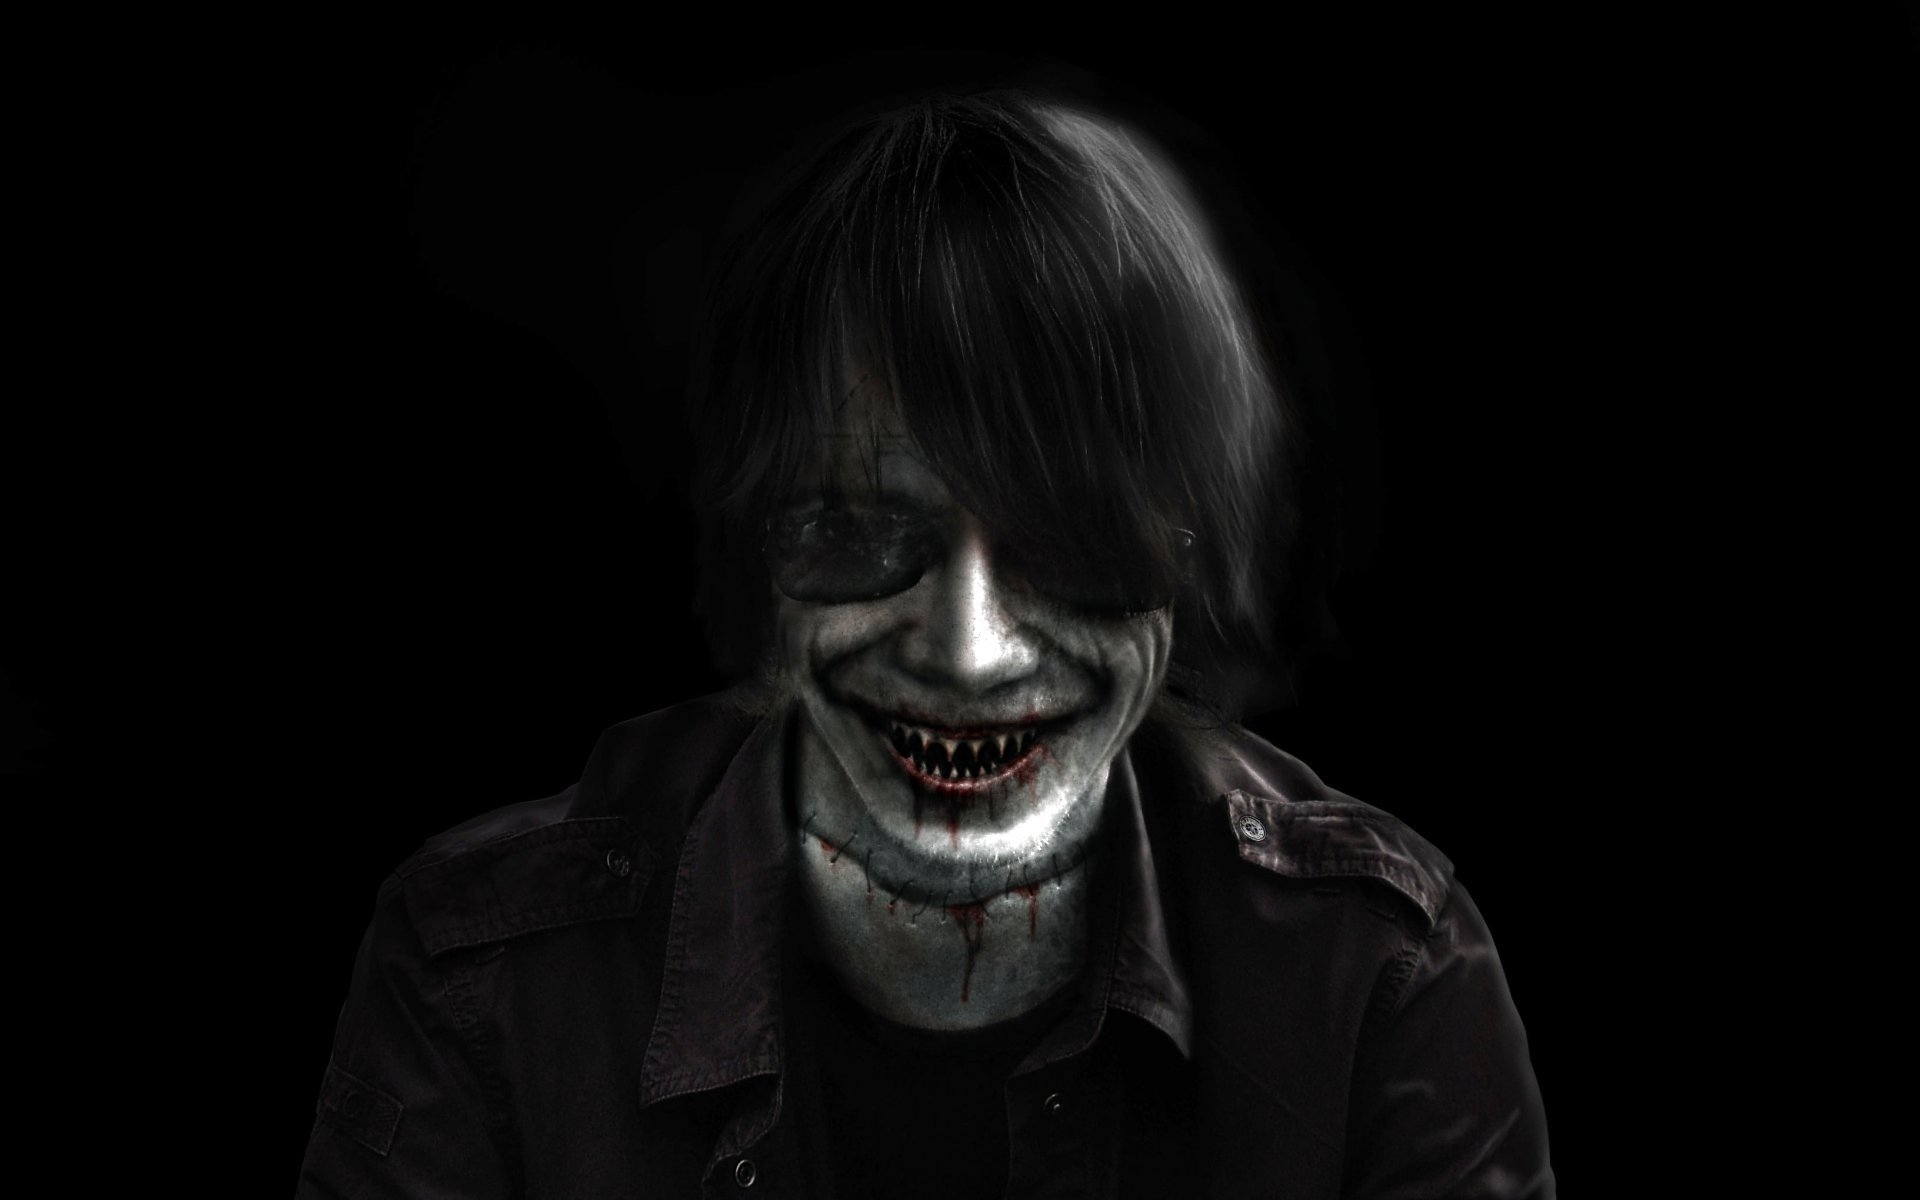 Evil Smile Wallpaper 67 images 1920x1200